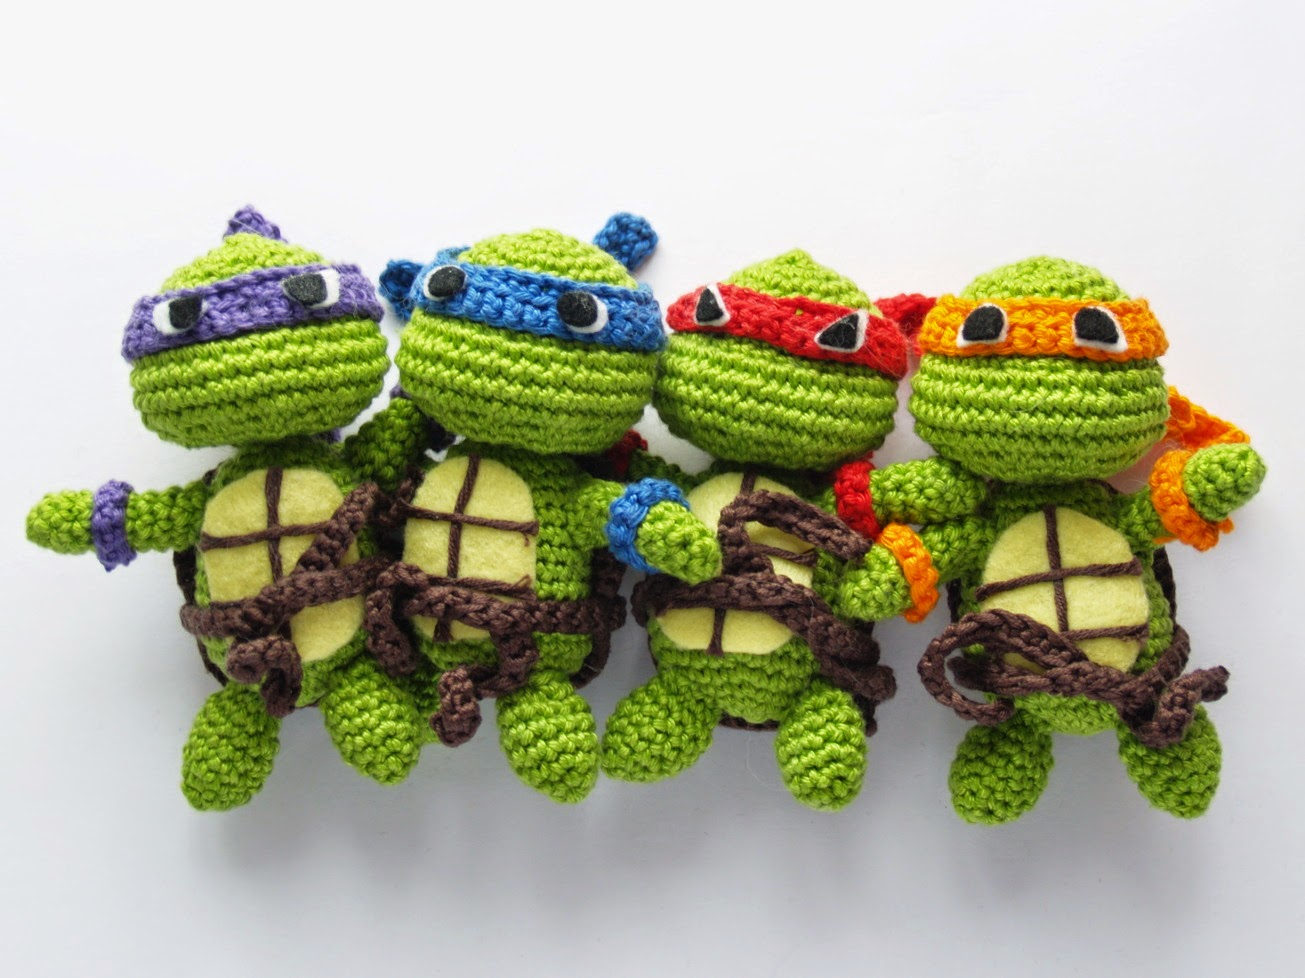 die teenage mutant ninja turtles